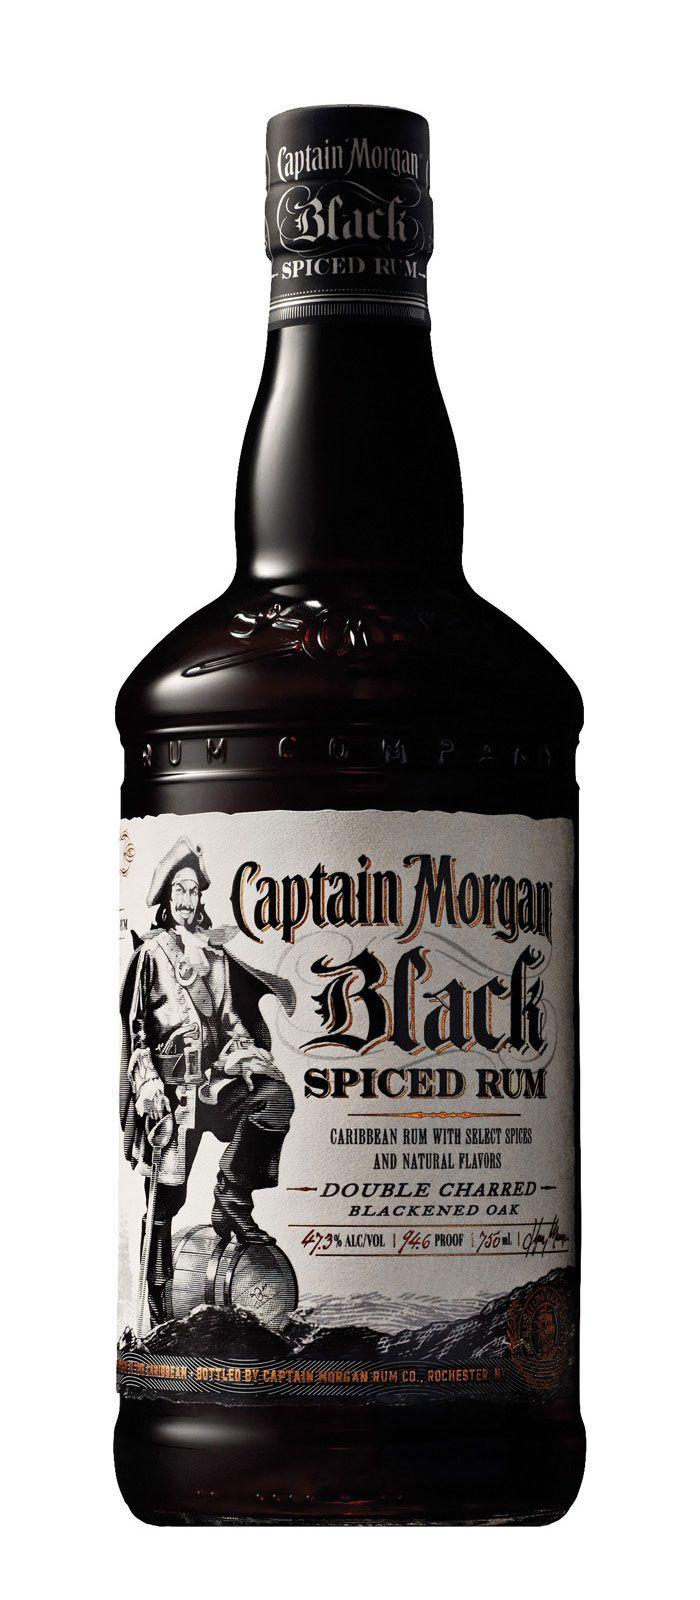 Captain Morgan Black SpicedRum - The Dieline - The #1 Package Design Website -